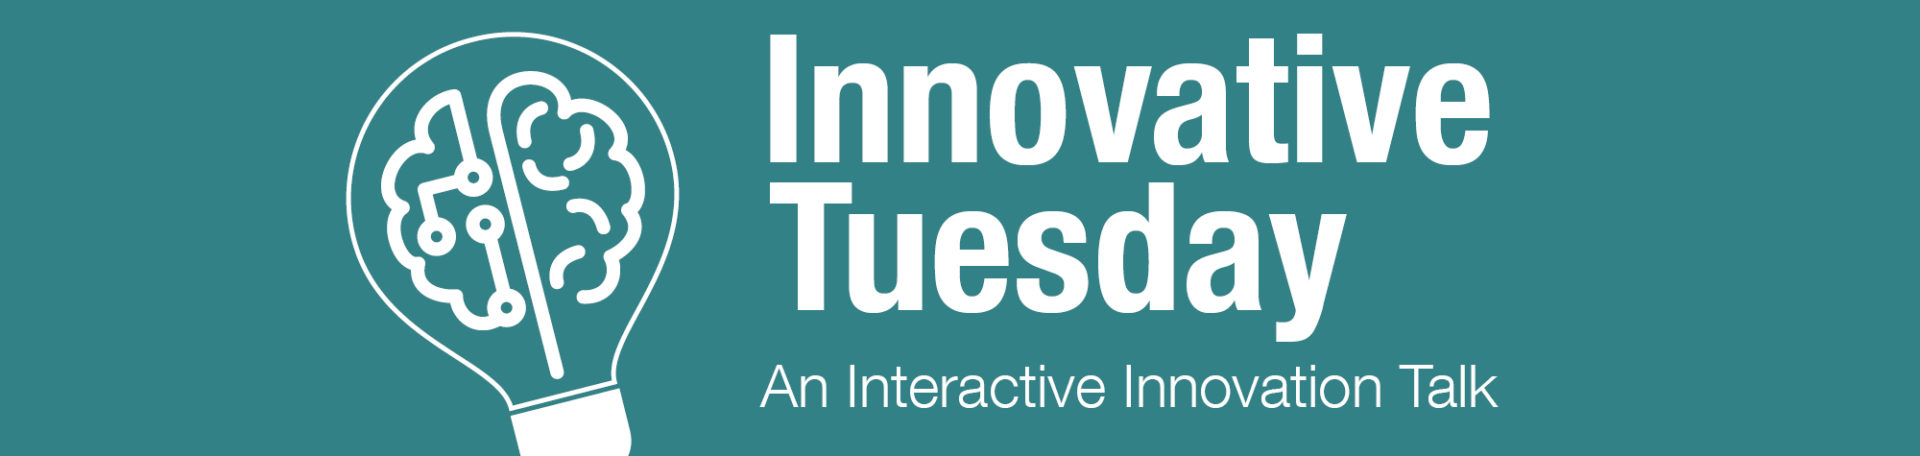 Innovative Tuesday <br> 14 May 2019